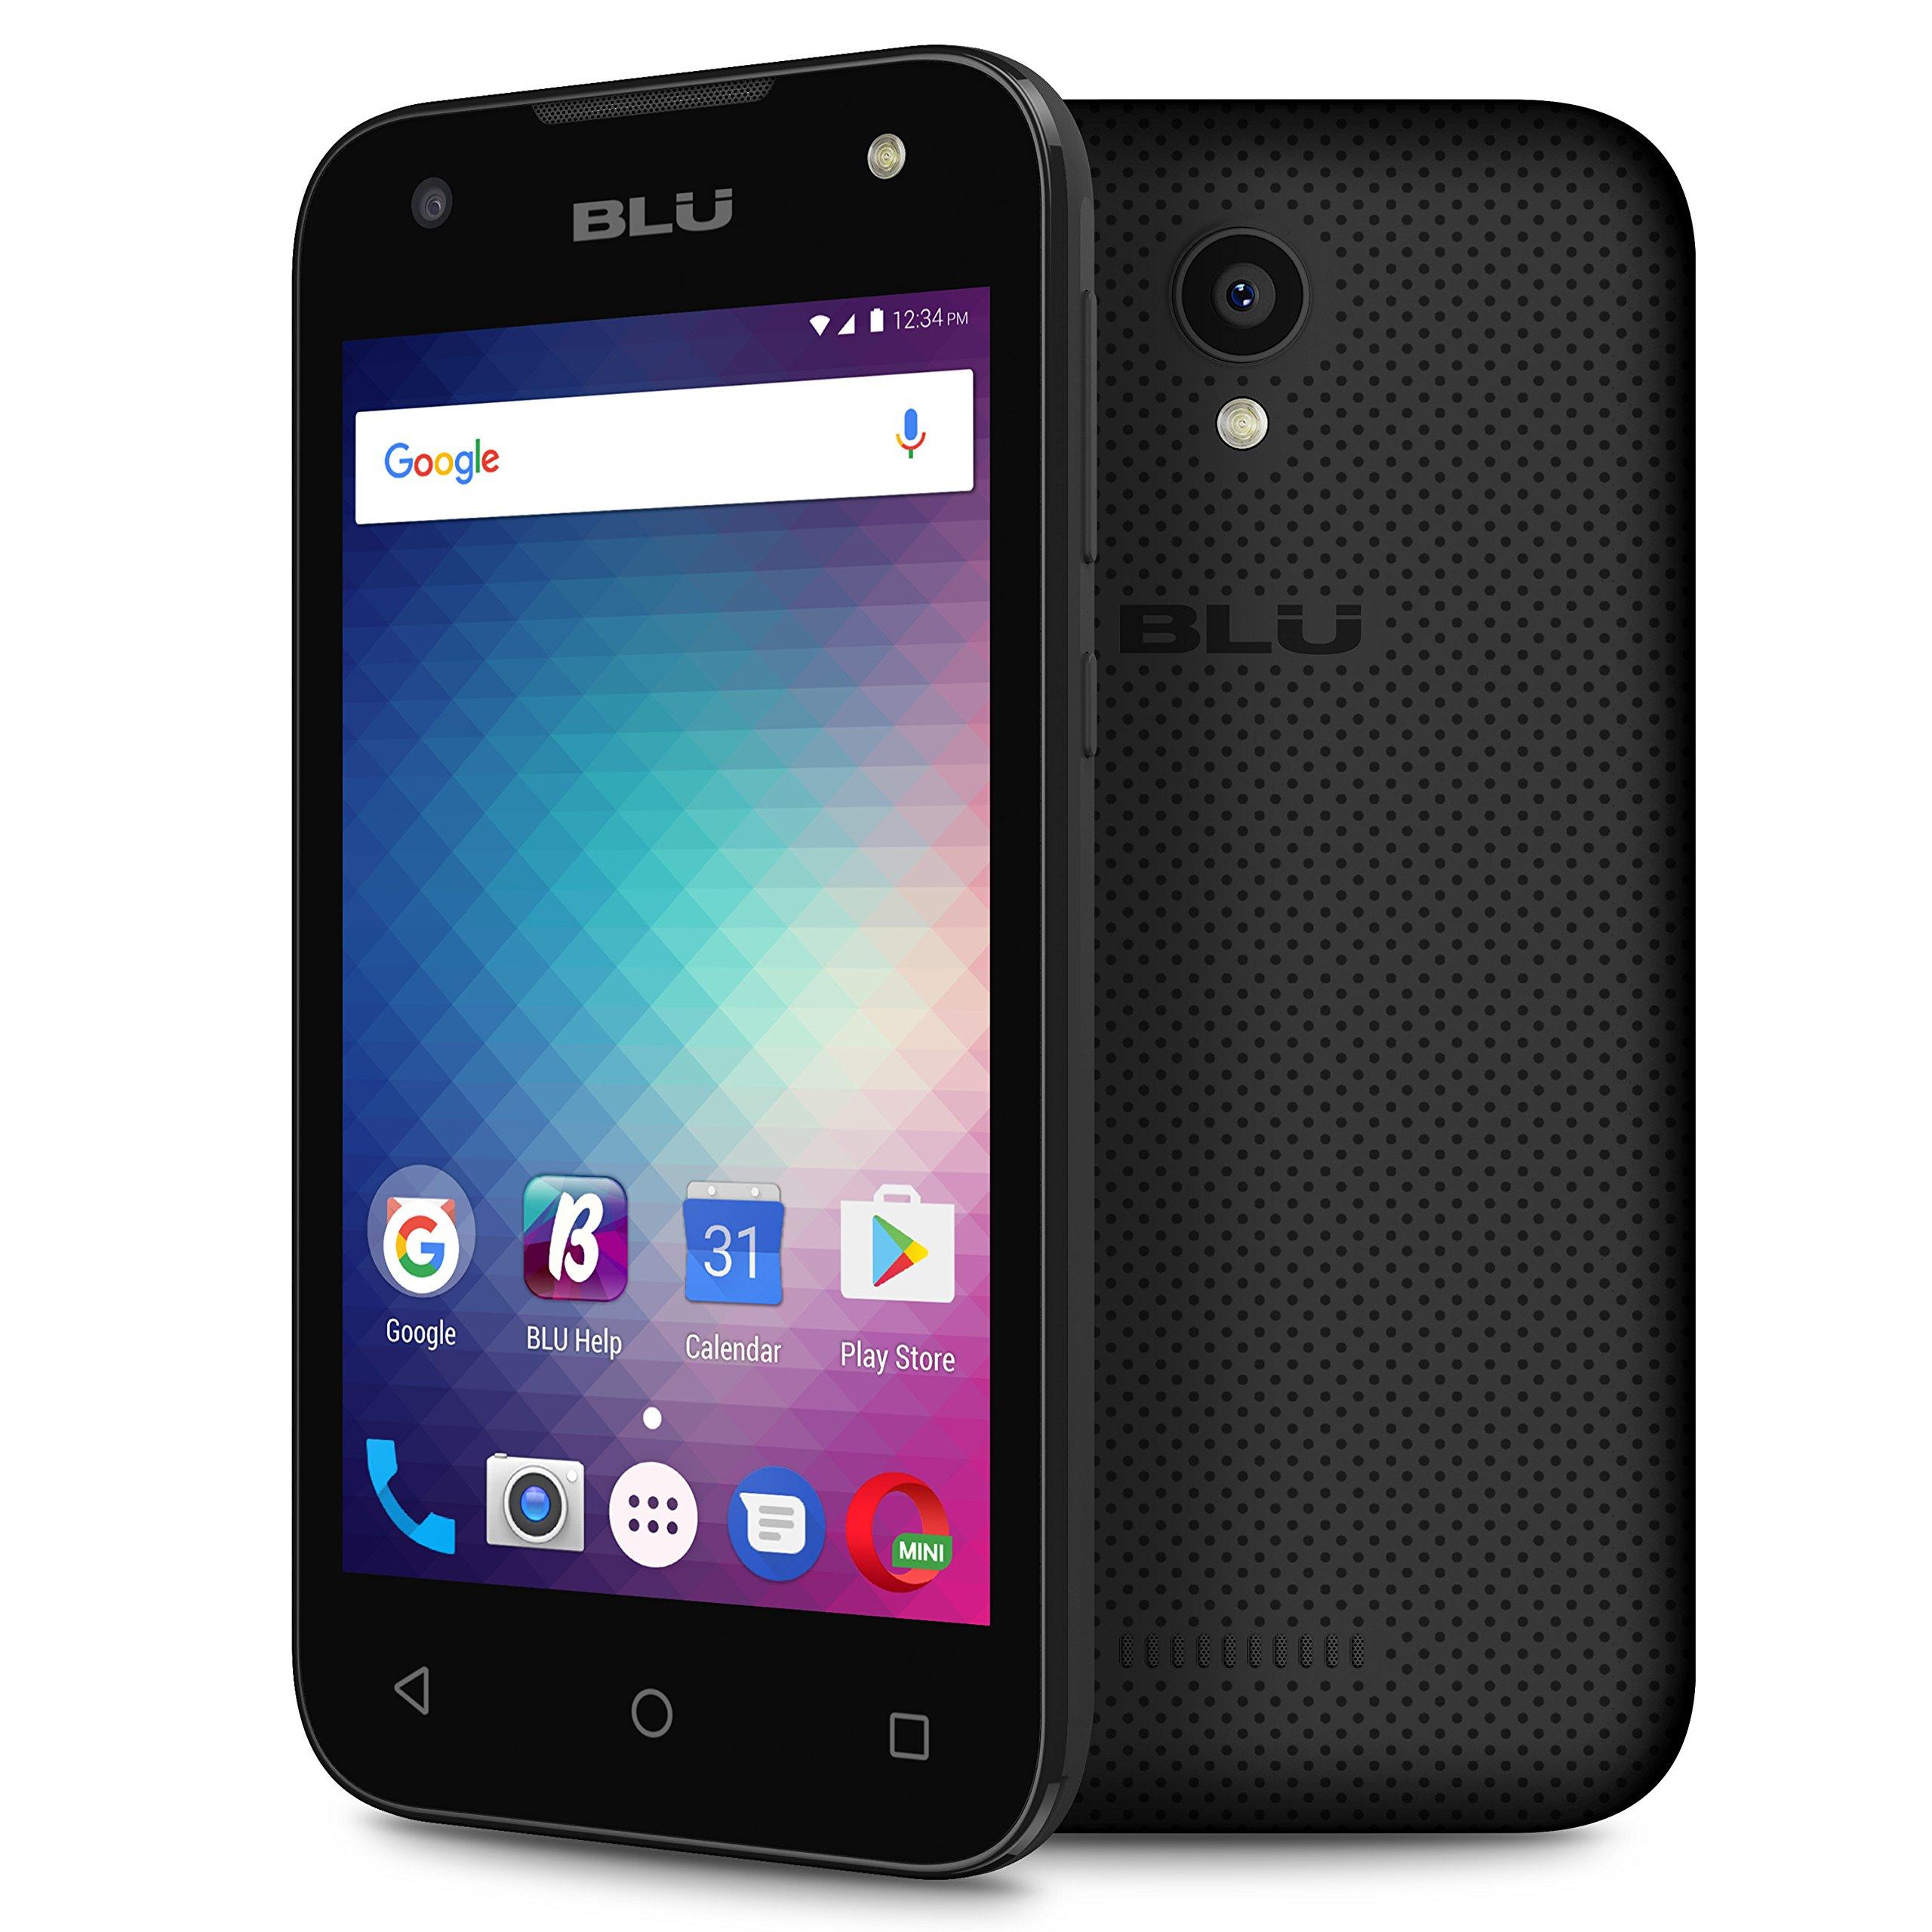 BLU Advance A4 -Unlocked Dual Sim Smartphone -Black by BLU (Image #2)